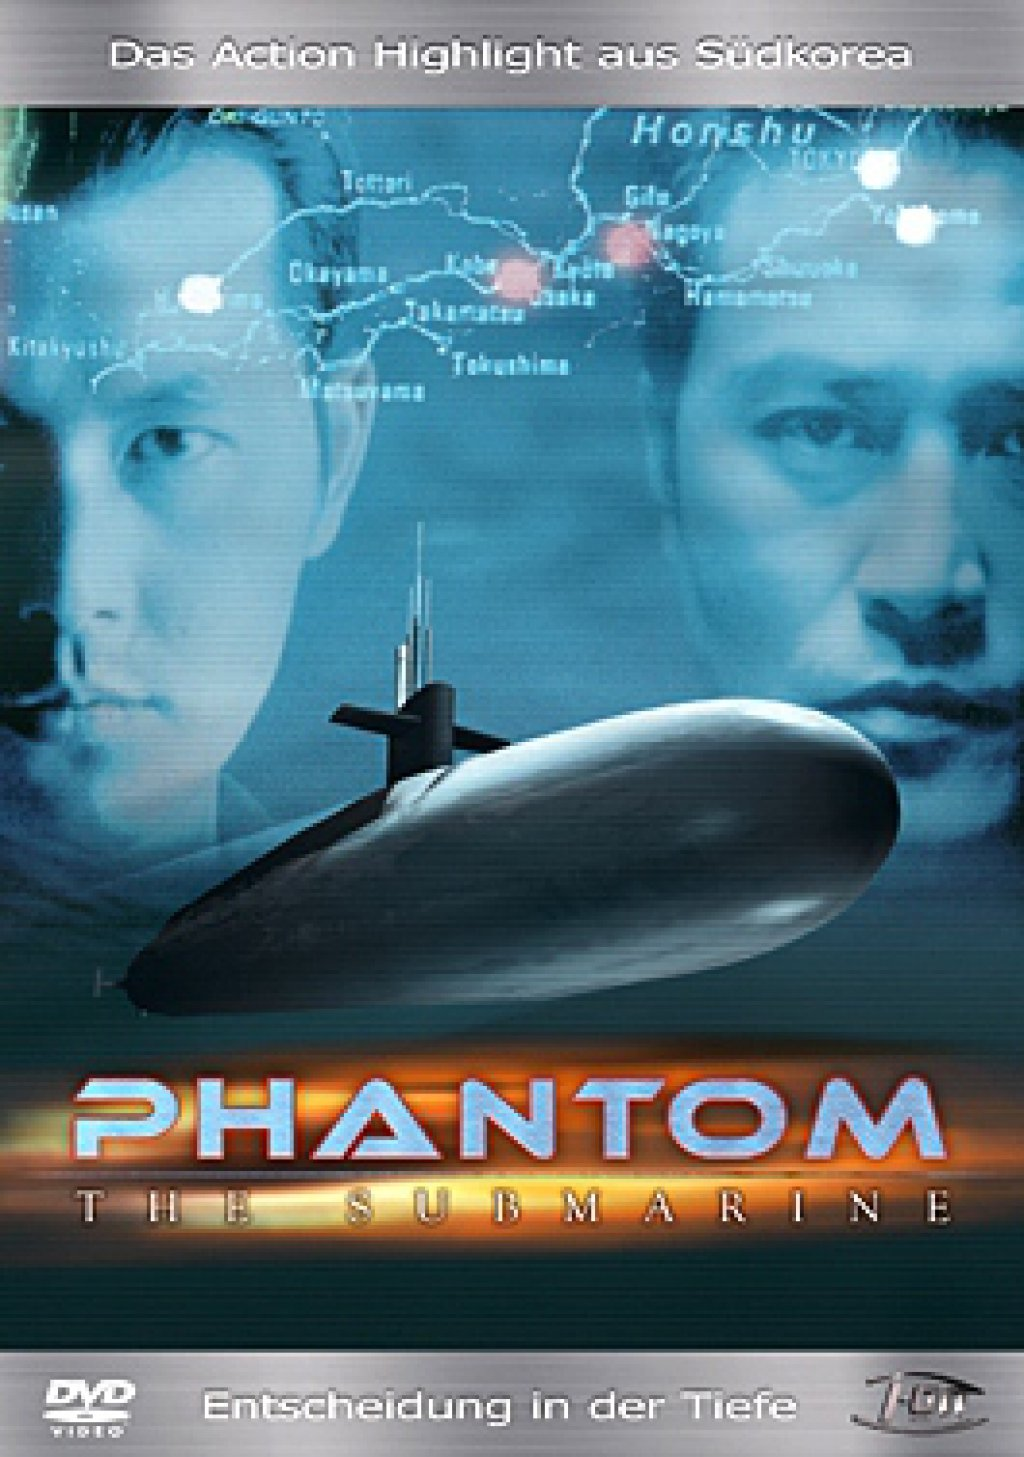 Phantom - The Submarine (DVD)